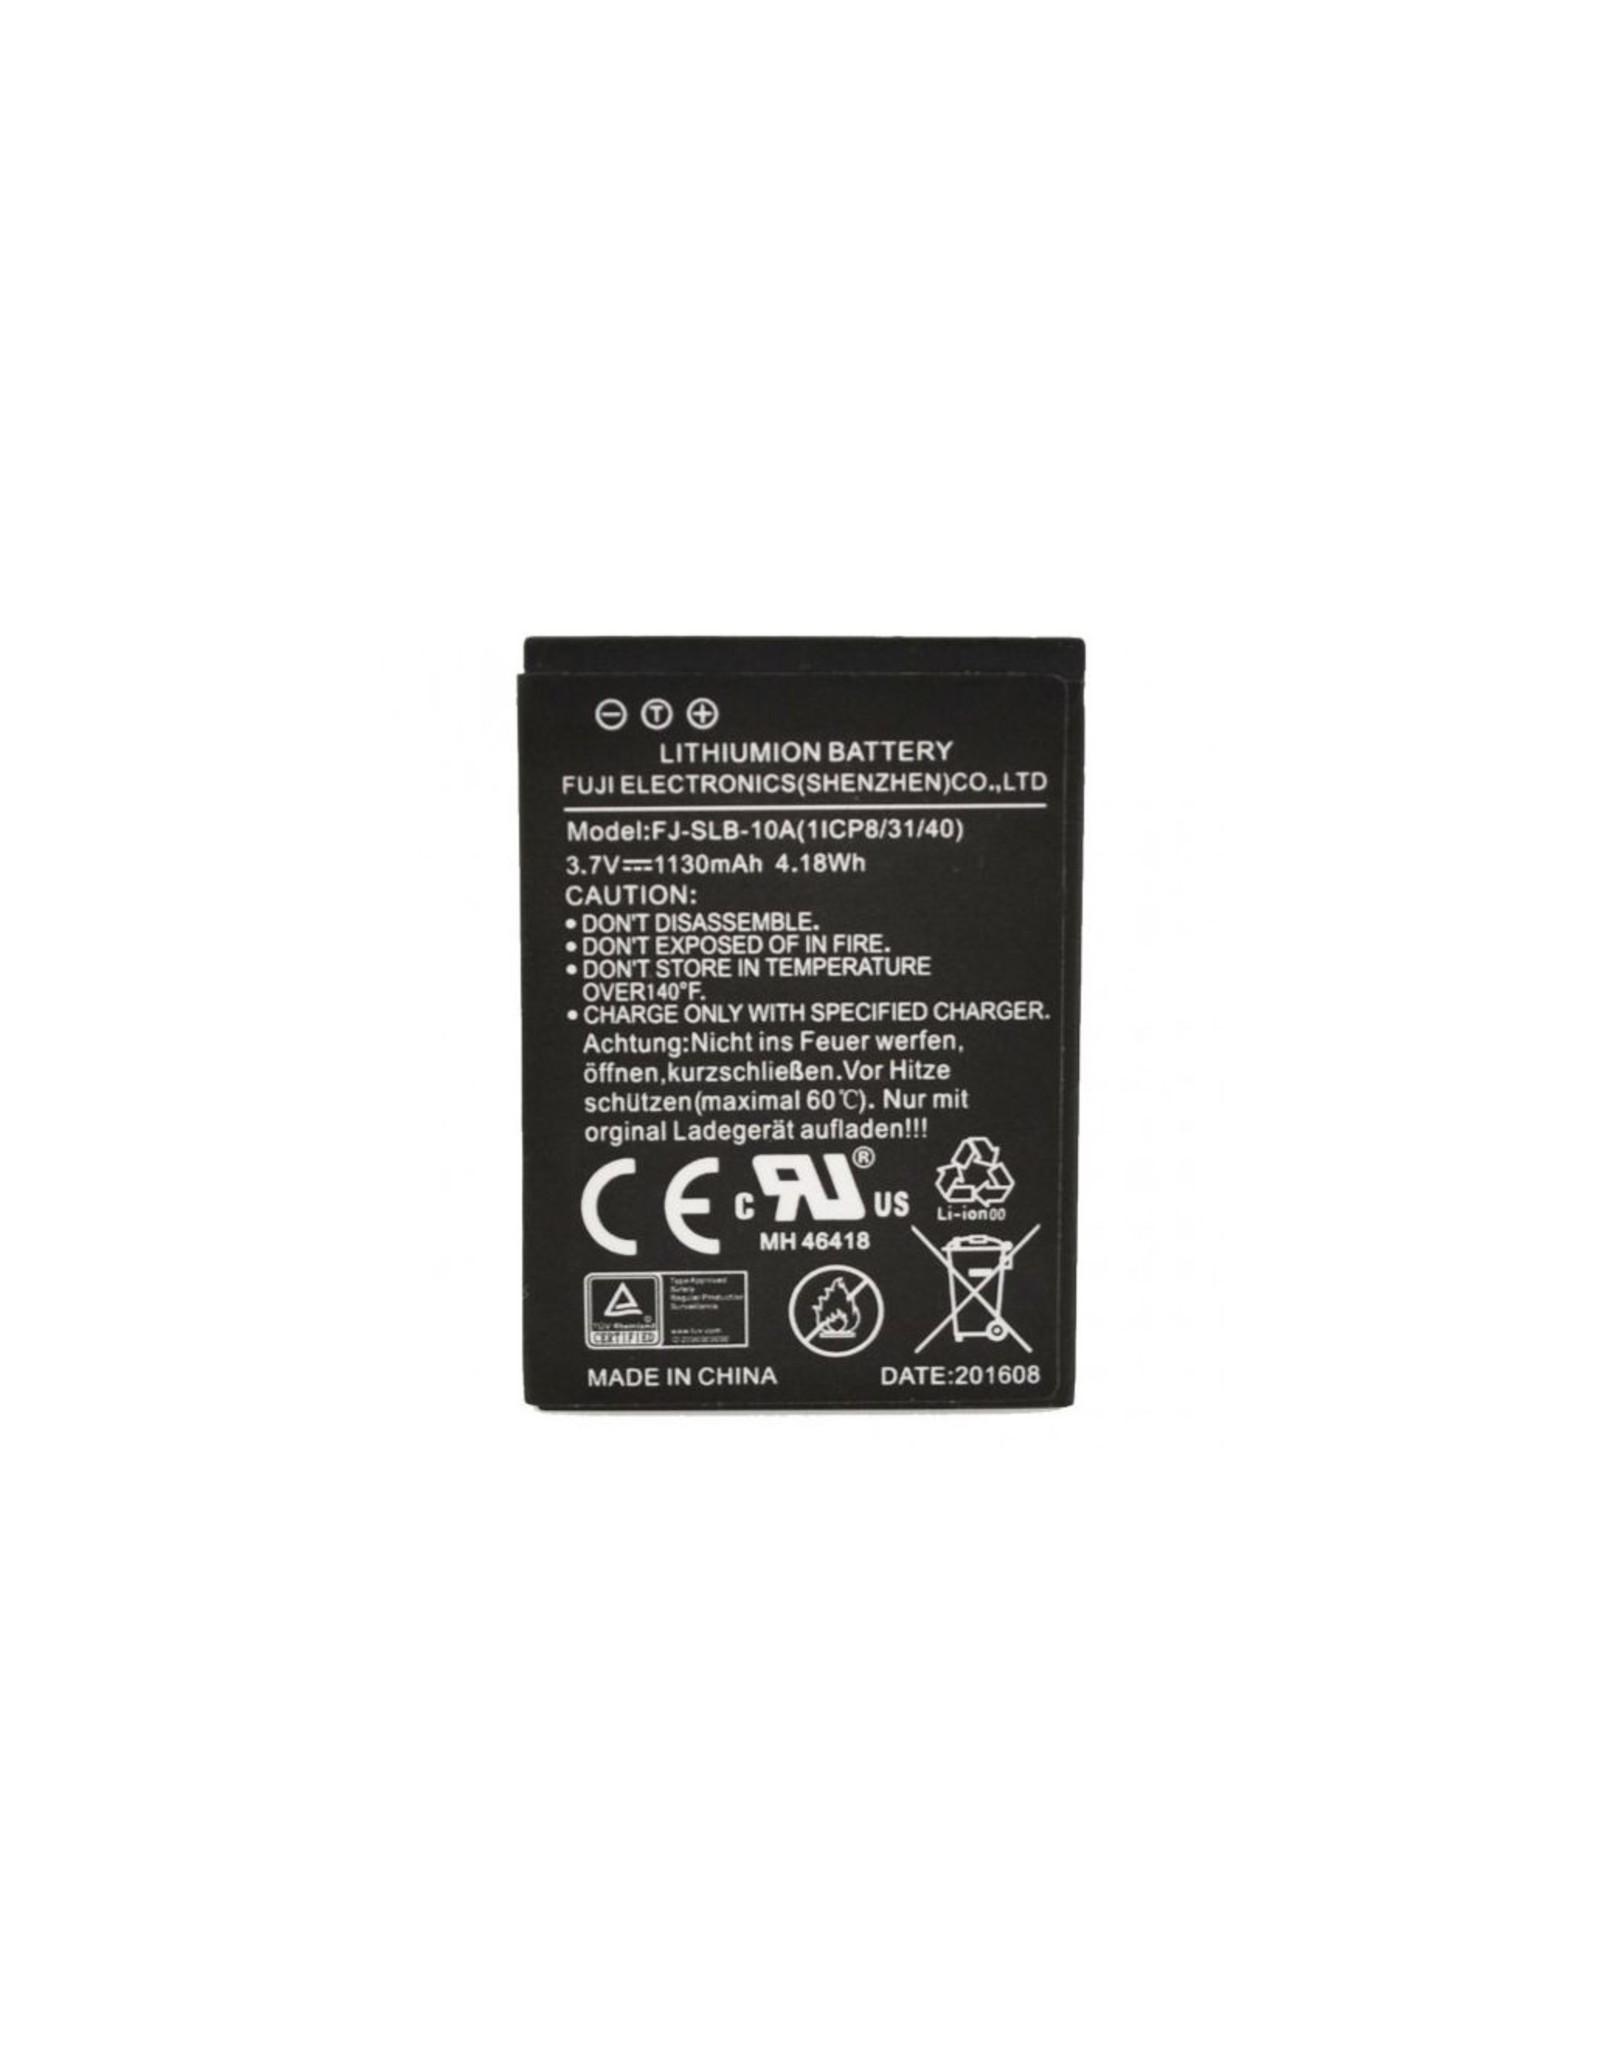 Sealife Sealife Battery for DC2000 (Li-ion, 3,7V, 1130mAh)